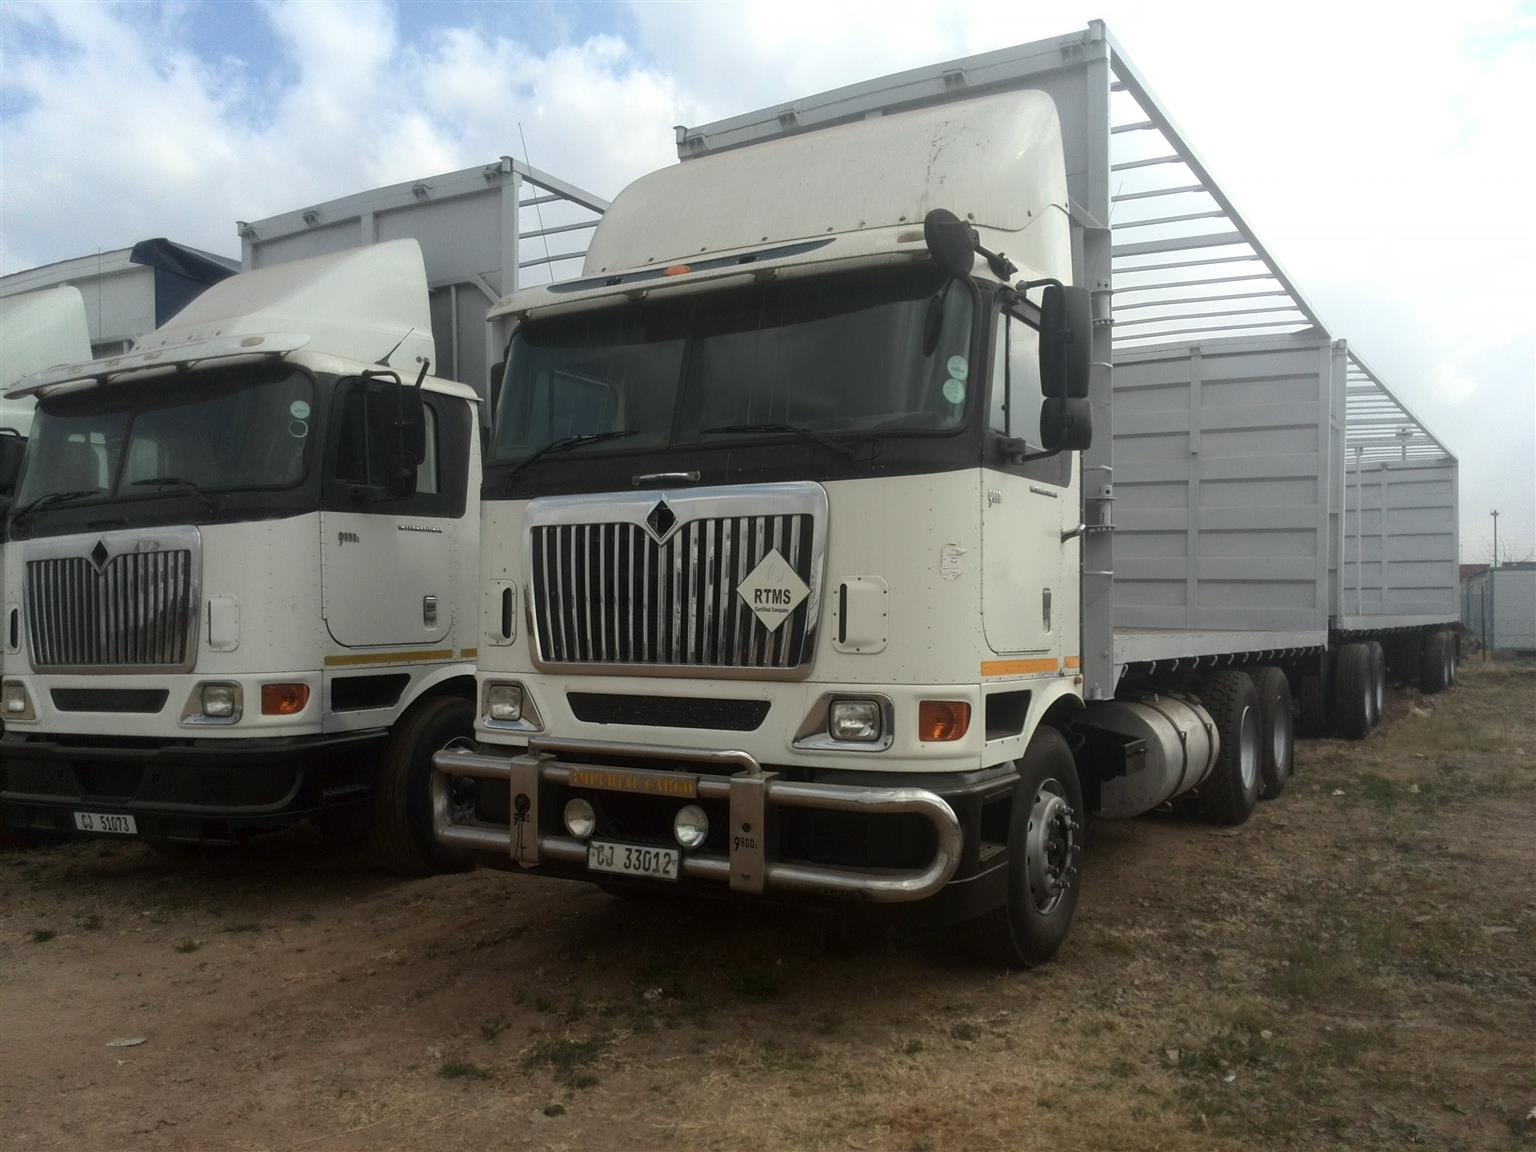 INTERNATIONAL SALE MADNESS - Posted by Lemeshen UBUNTU Truck Sales